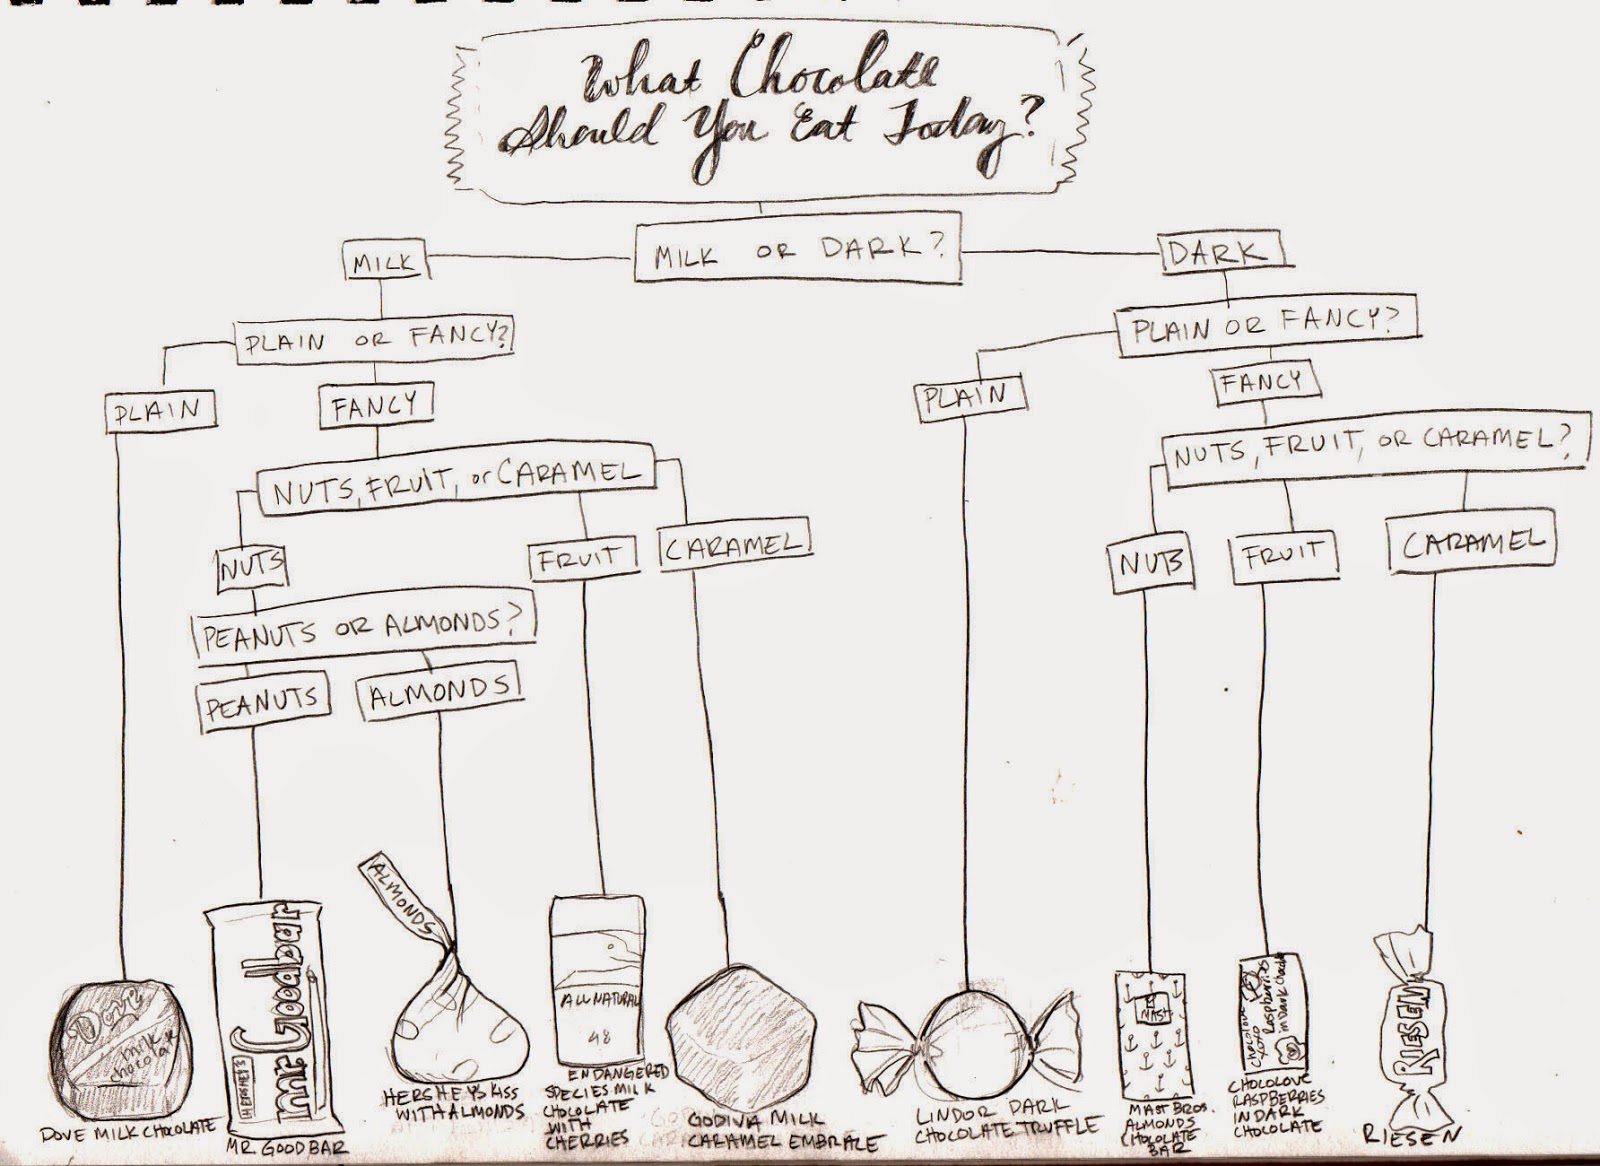 monday fun chocolate flow chart quiz [ 1600 x 1166 Pixel ]